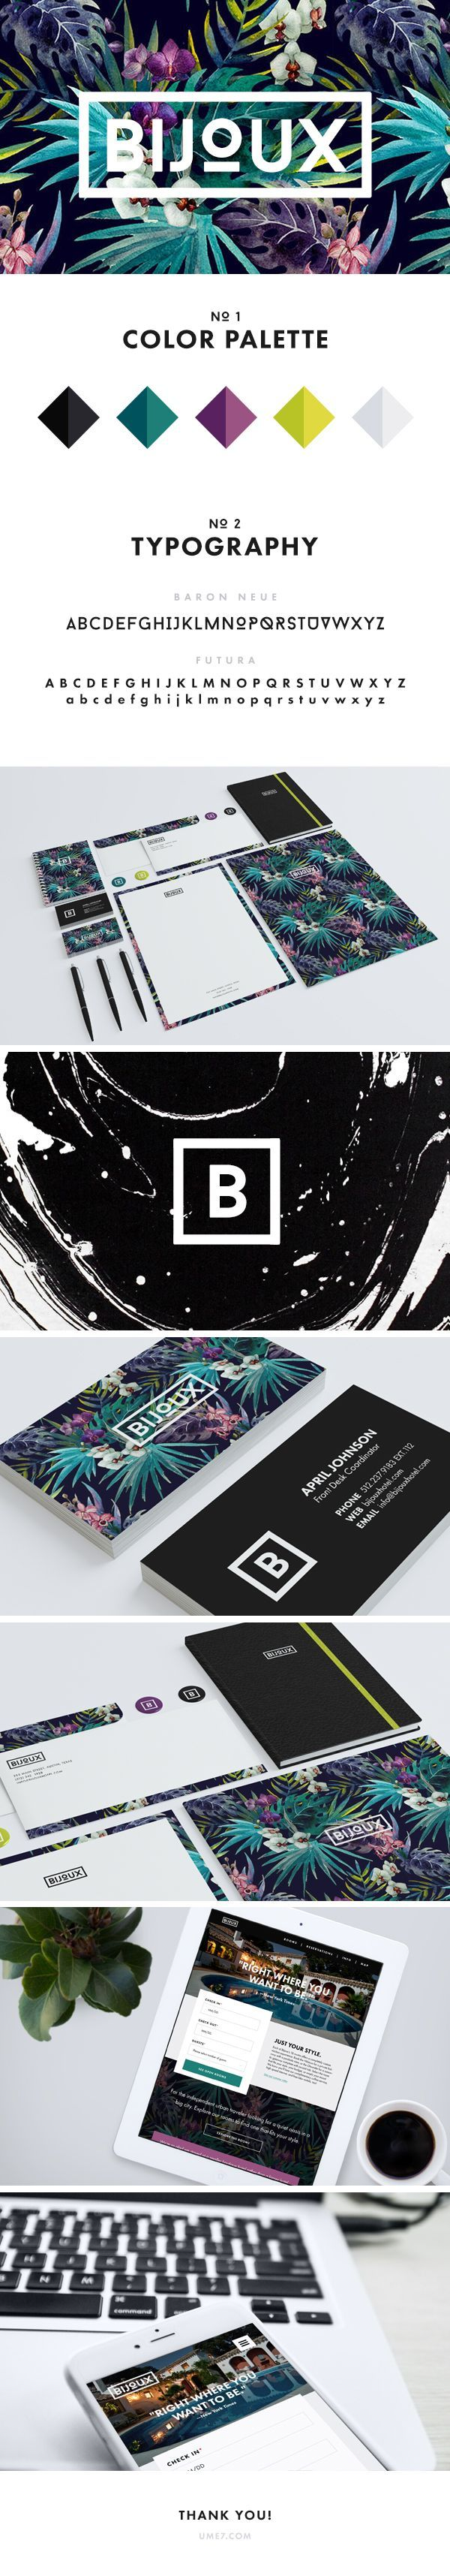 Perfect burst of colors for this branding design template! #brandingdesign